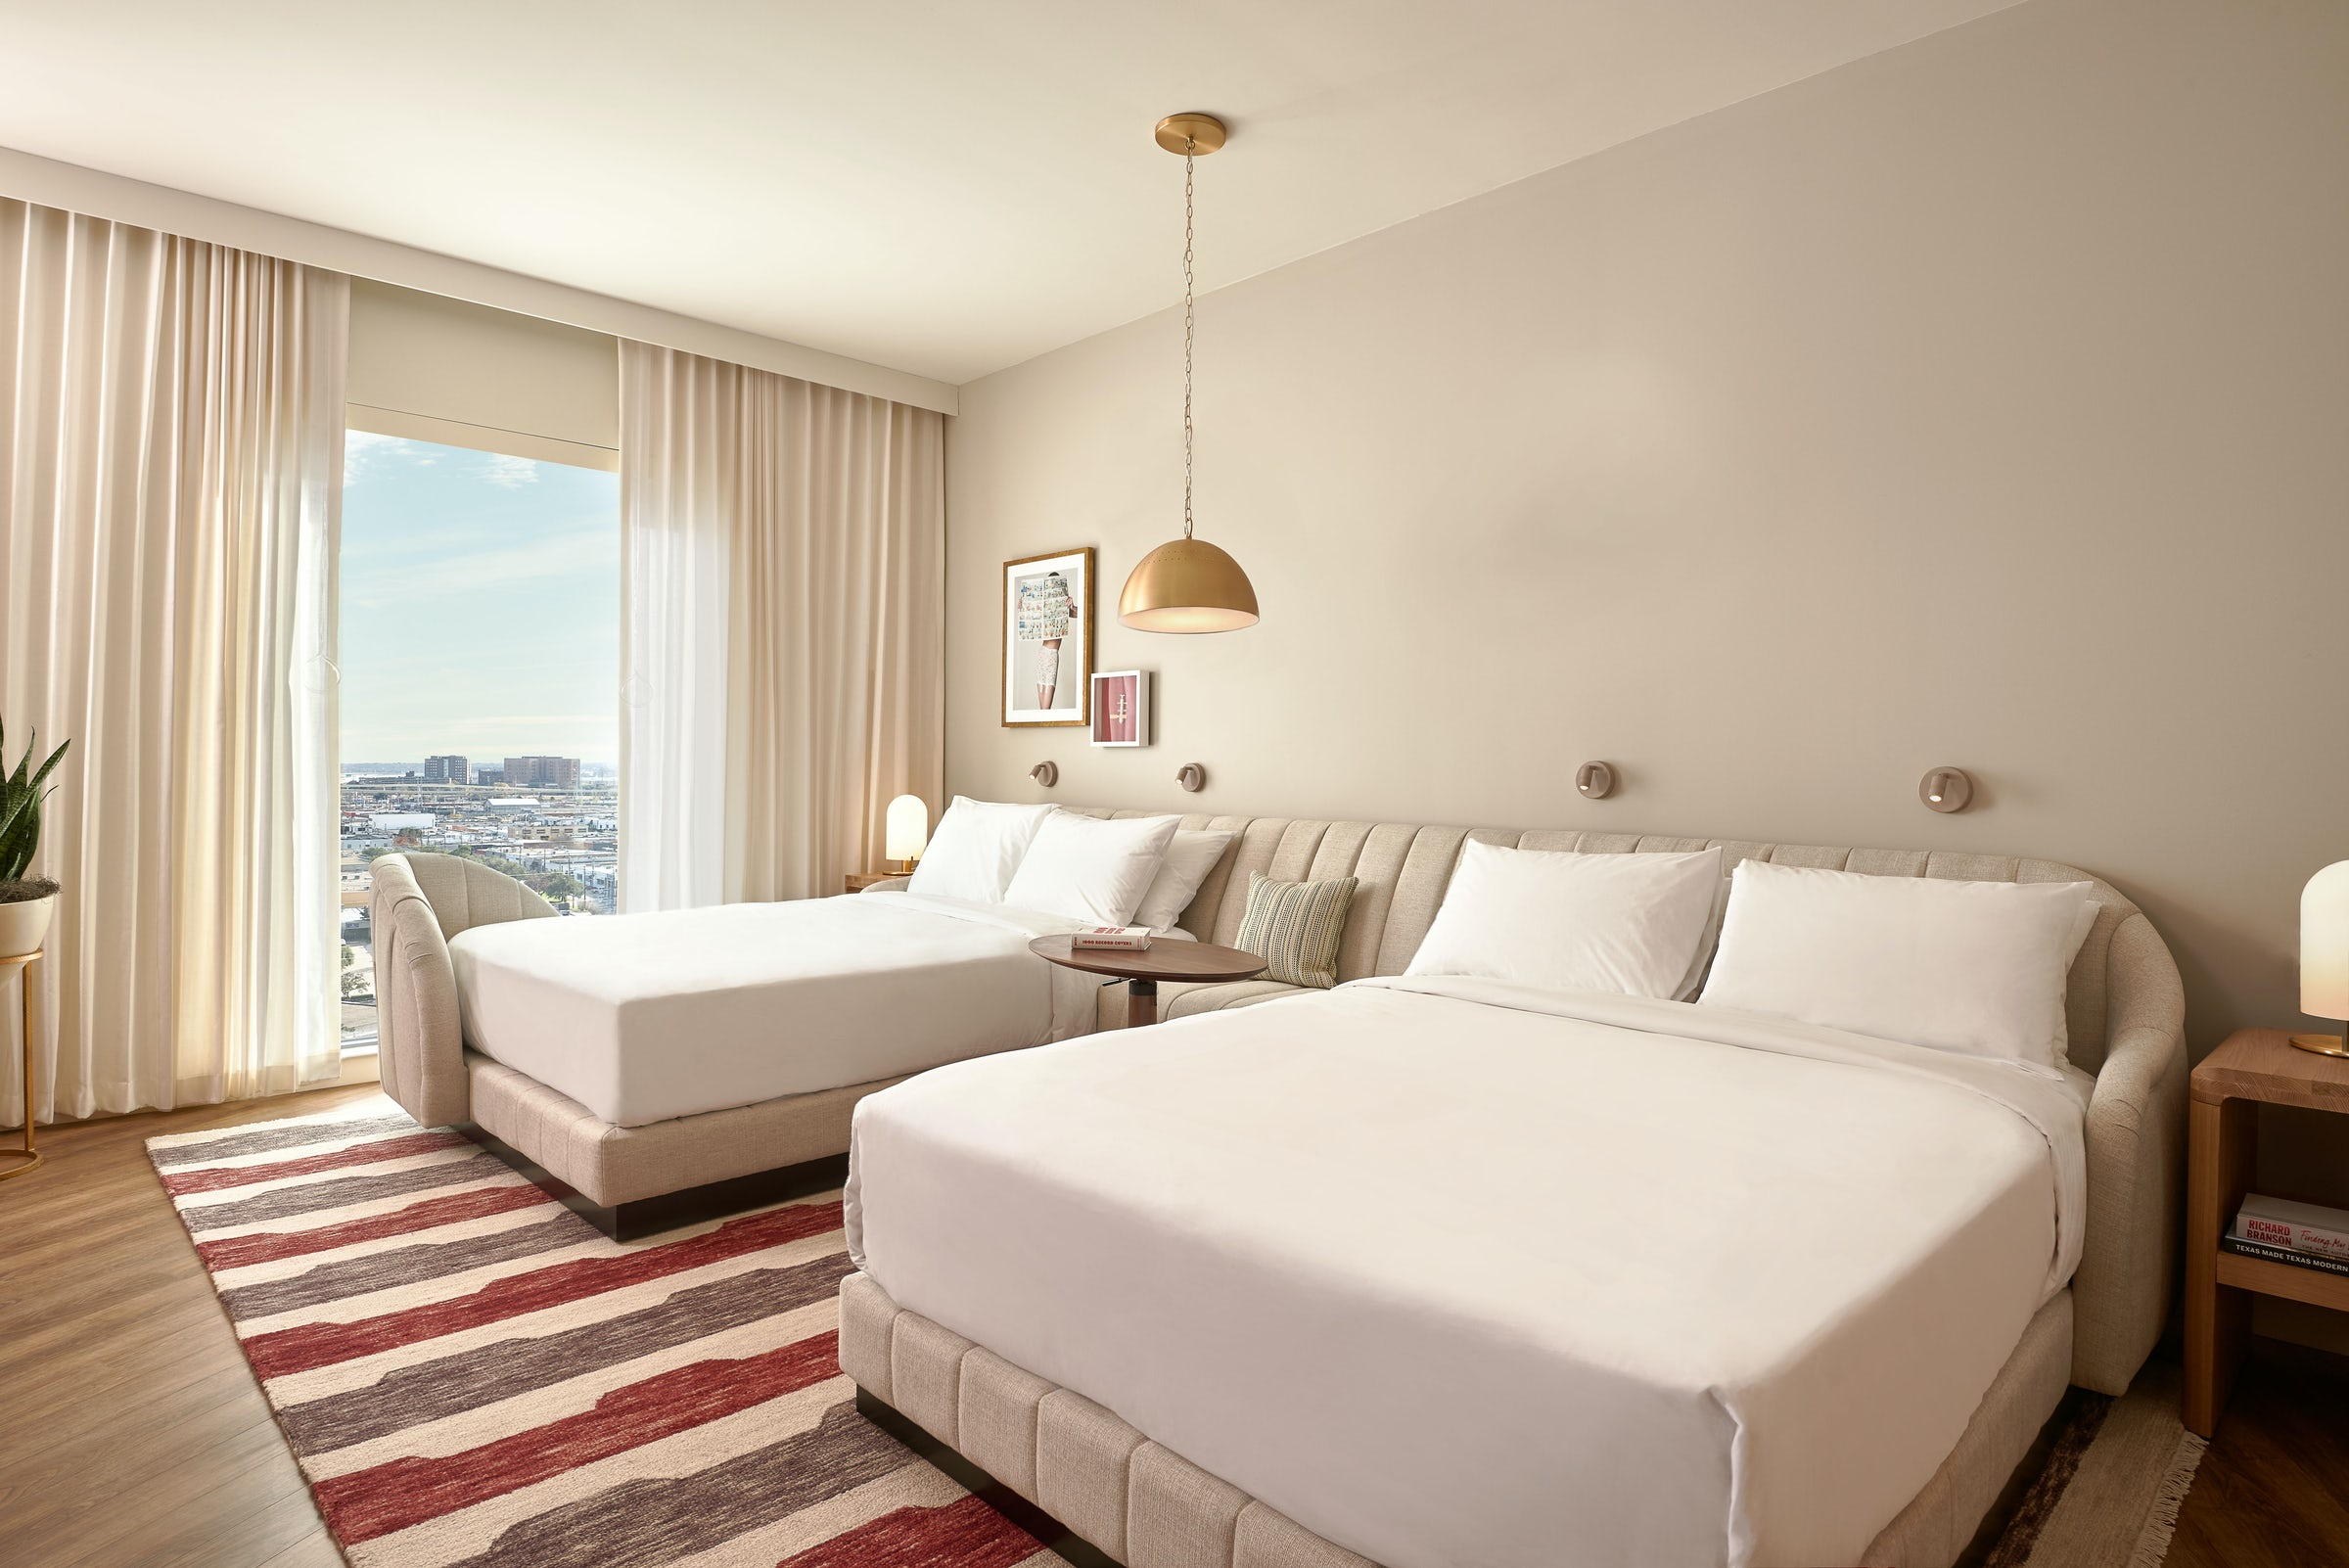 Virgin Hotels Dallas in Beyond Dallas